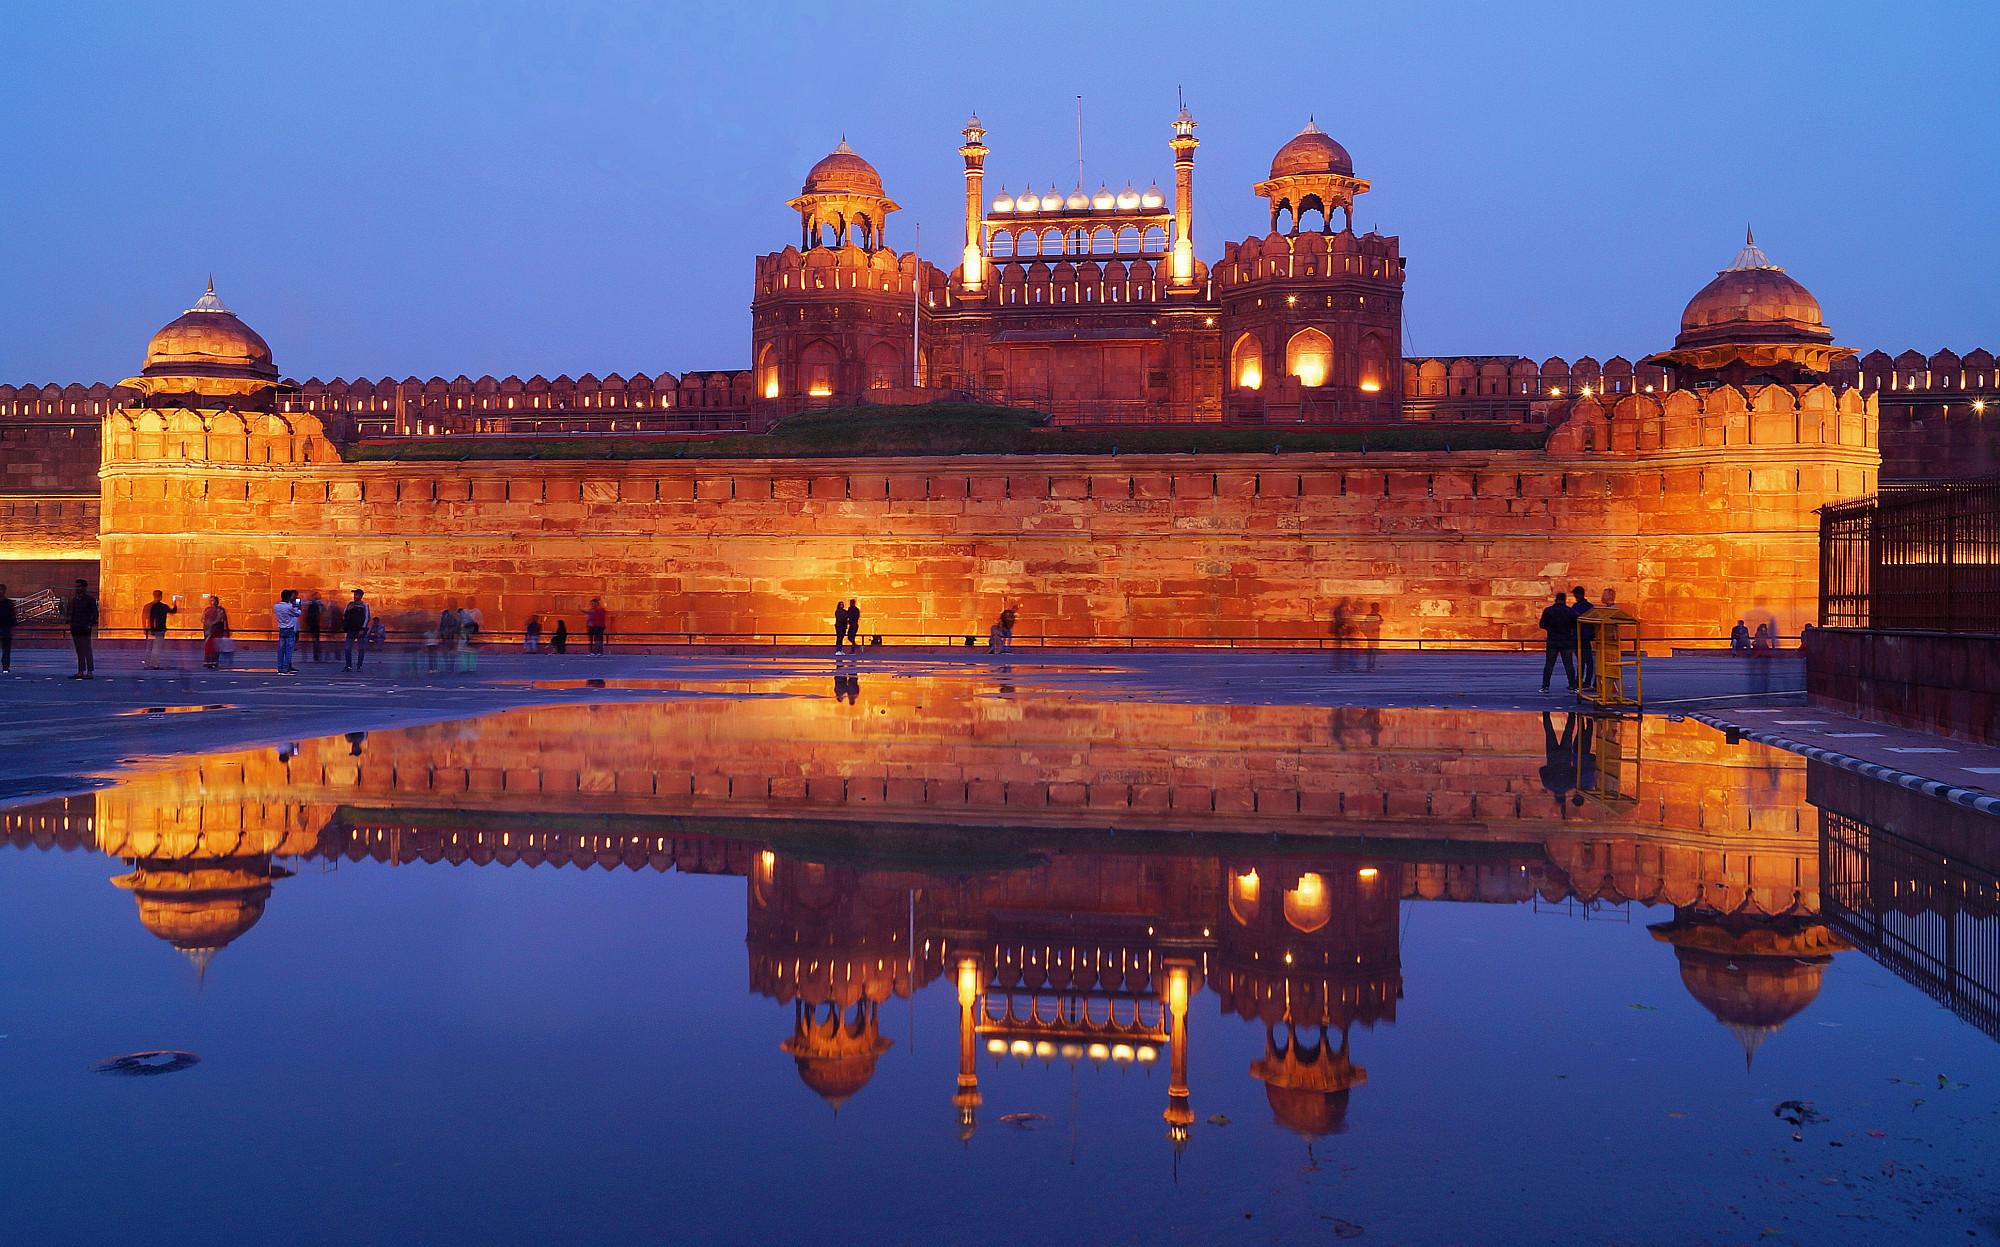 Lal Qila (Red Fort) Delhi